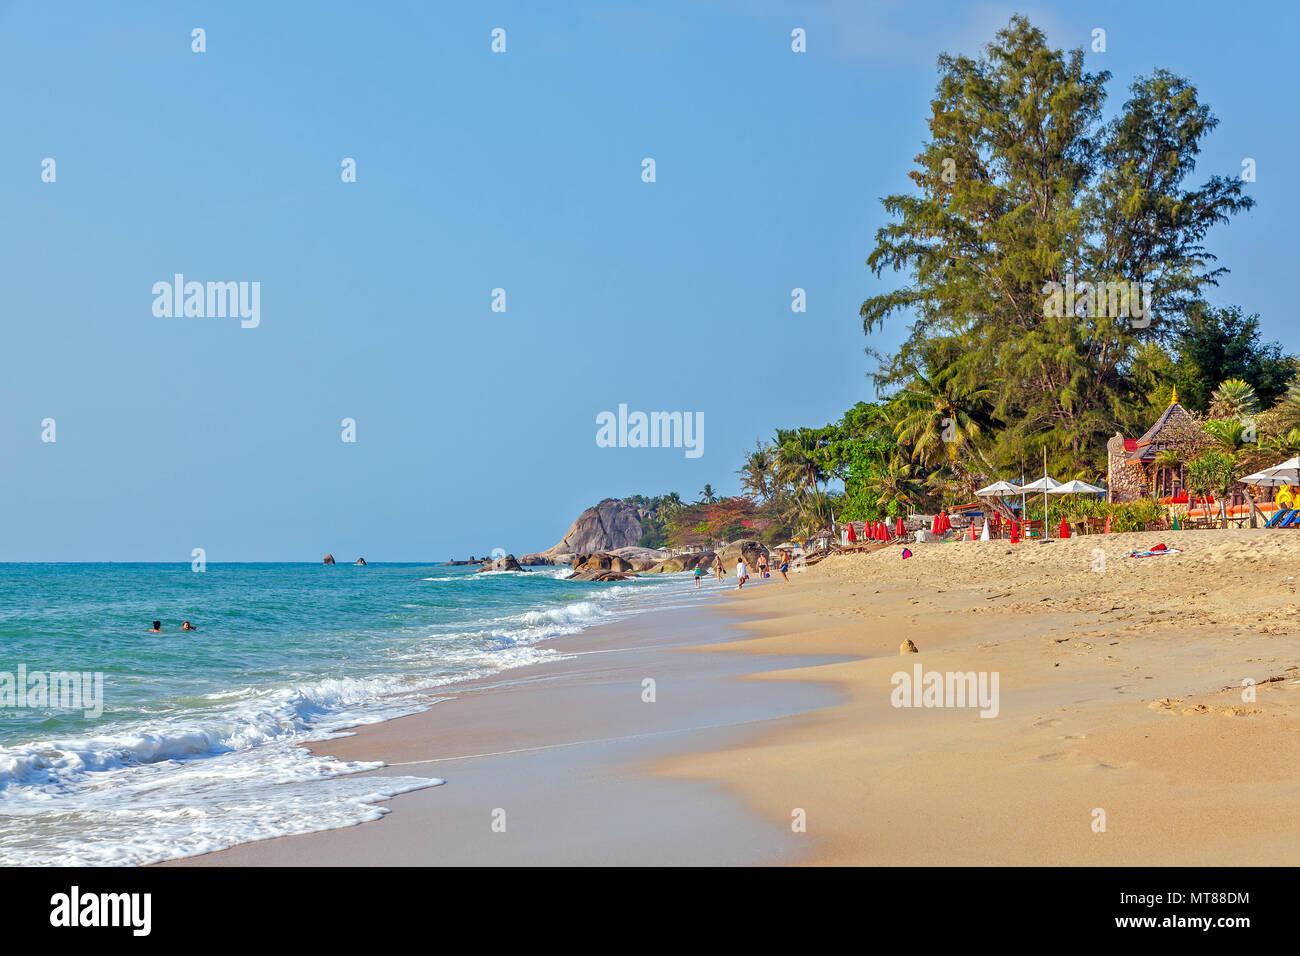 Mañana soleada en la playa de Lamai. Koh Samui. Tailandia. Imagen De Stock